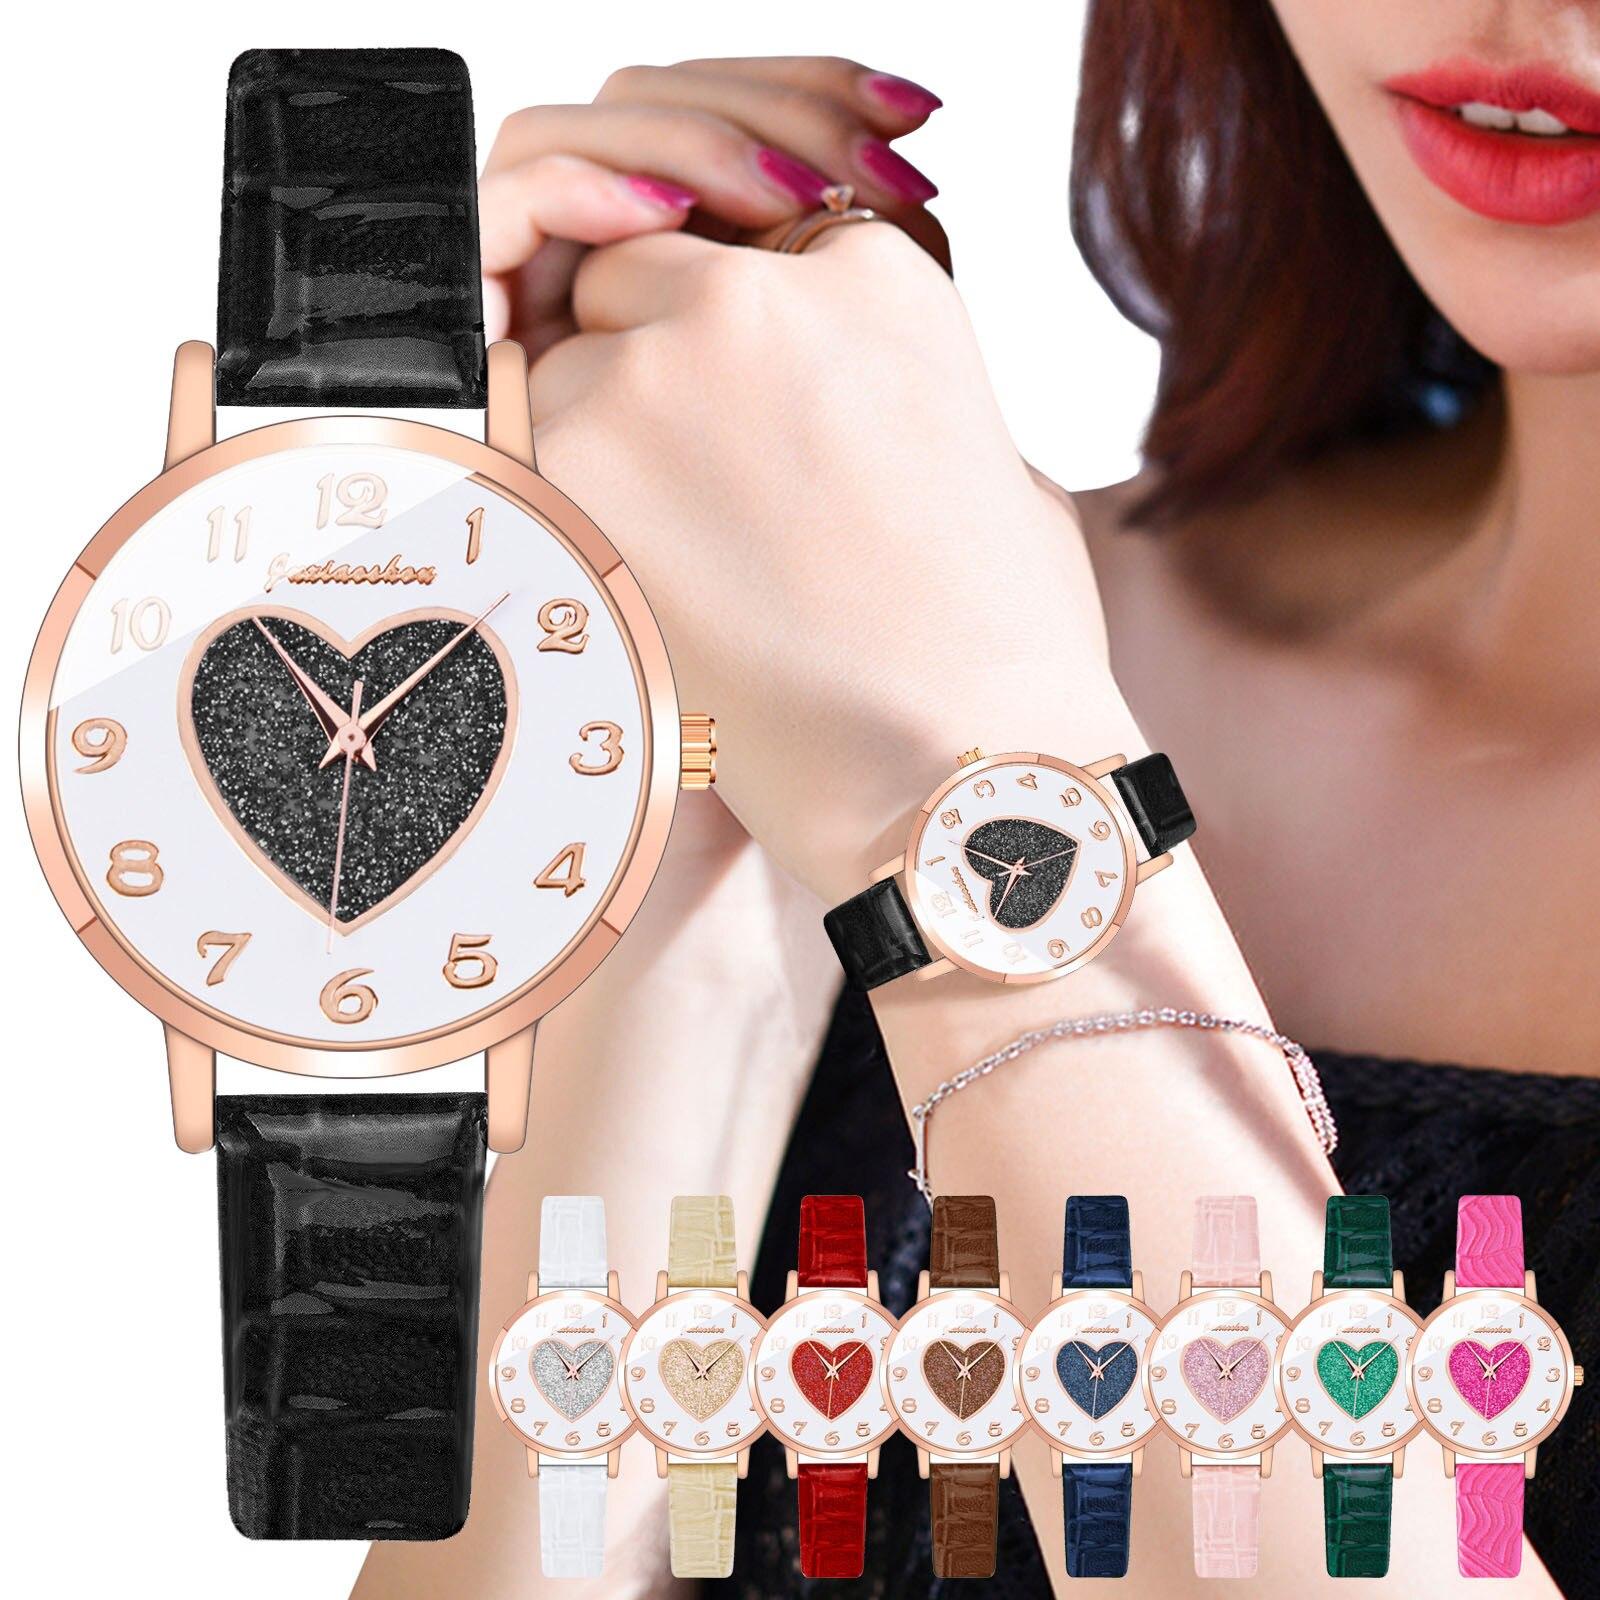 Hotest Waterproof Watch Juxiaoshou JXS05 Ladies Quartz Watch Leather Strap Rotating Women's Luxury Watch наручные часы женские часы наручные женские taya цвет черный t w 0065 watch gl black